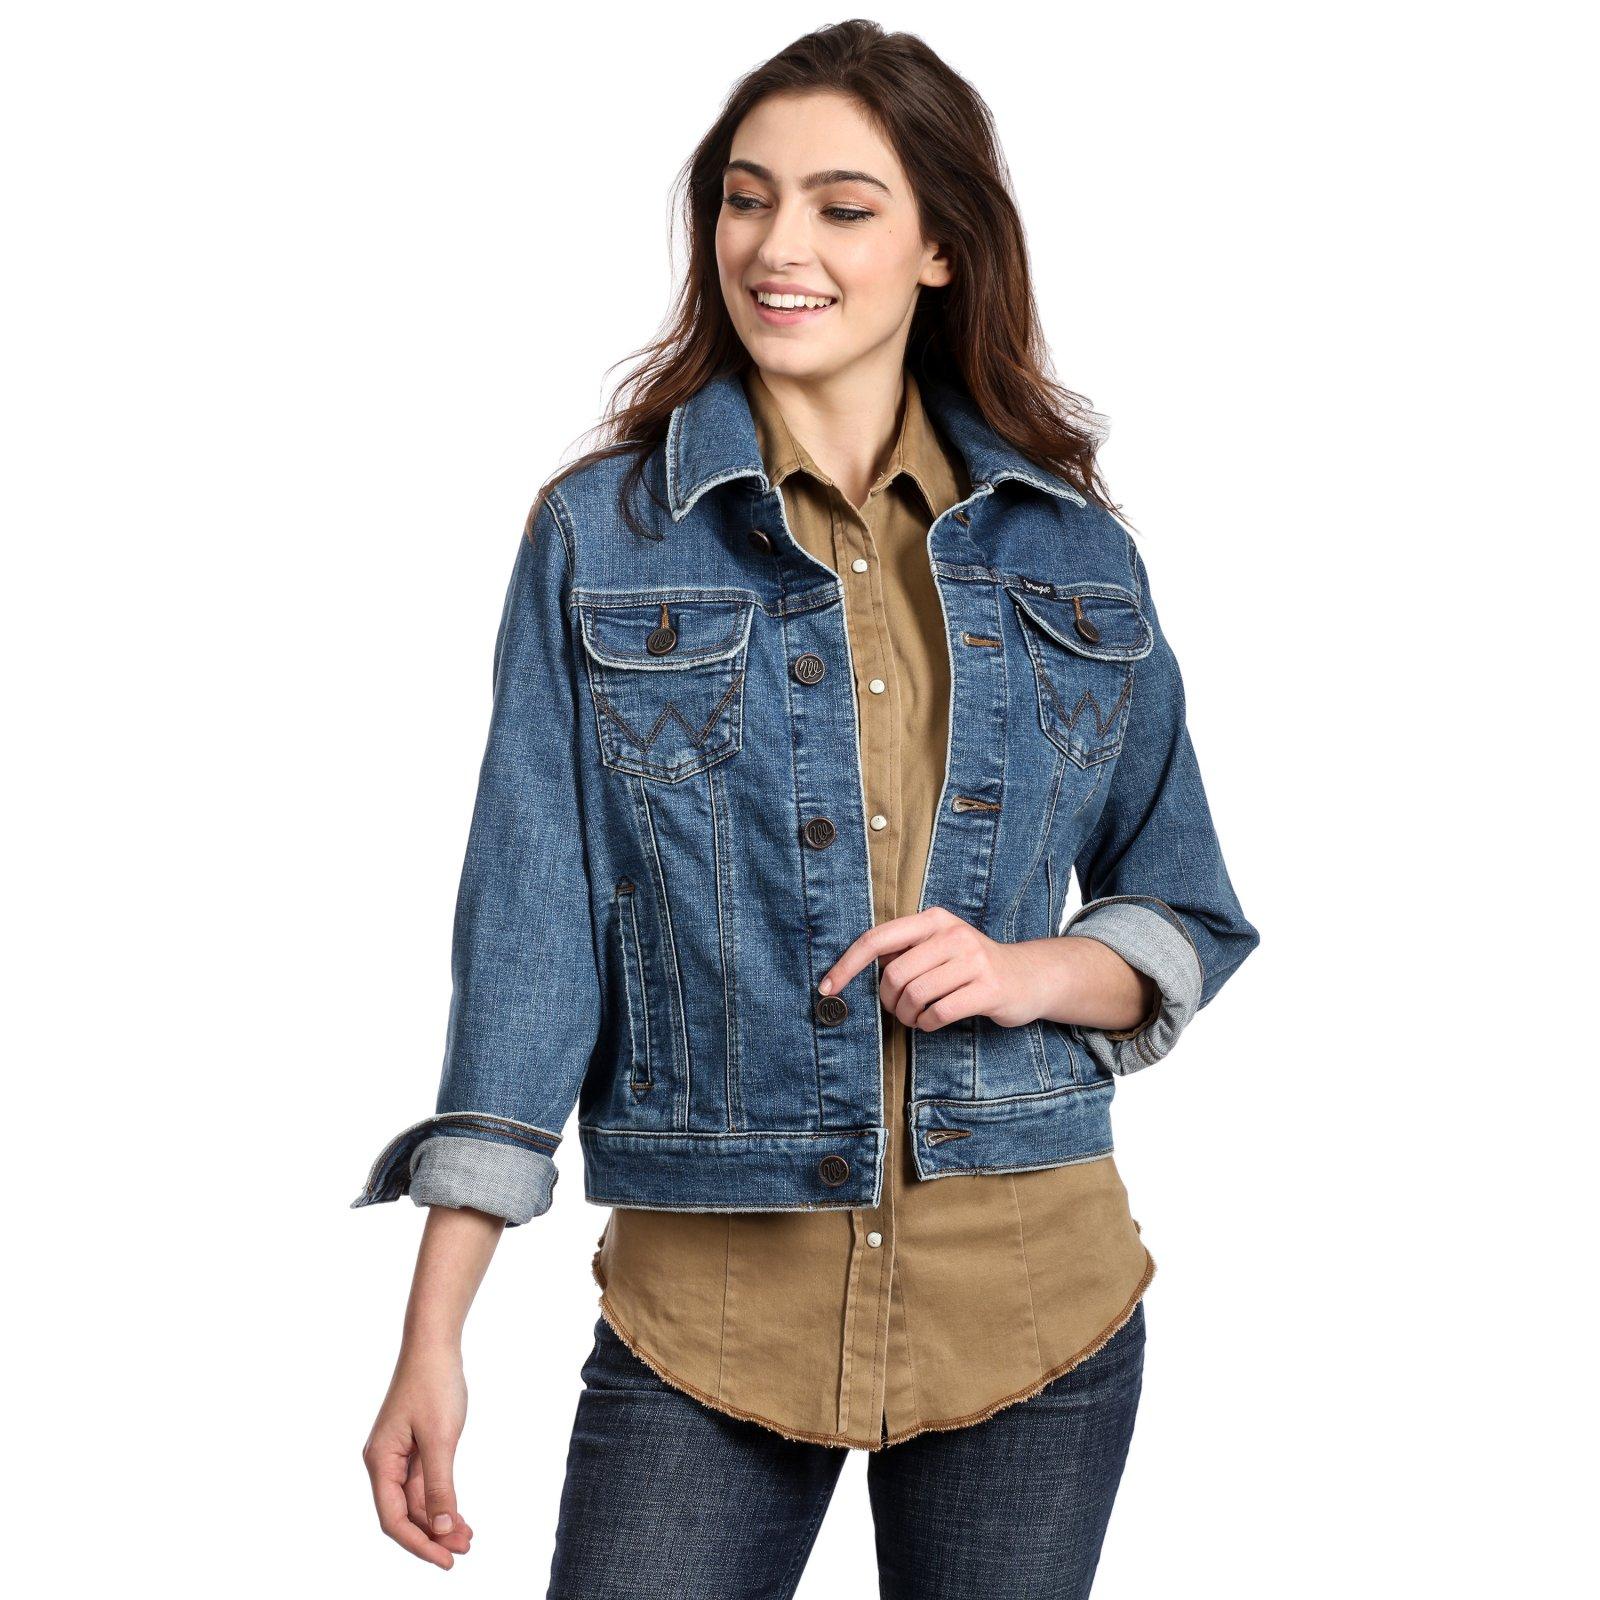 Ladies Denim Jacket from Wrangler